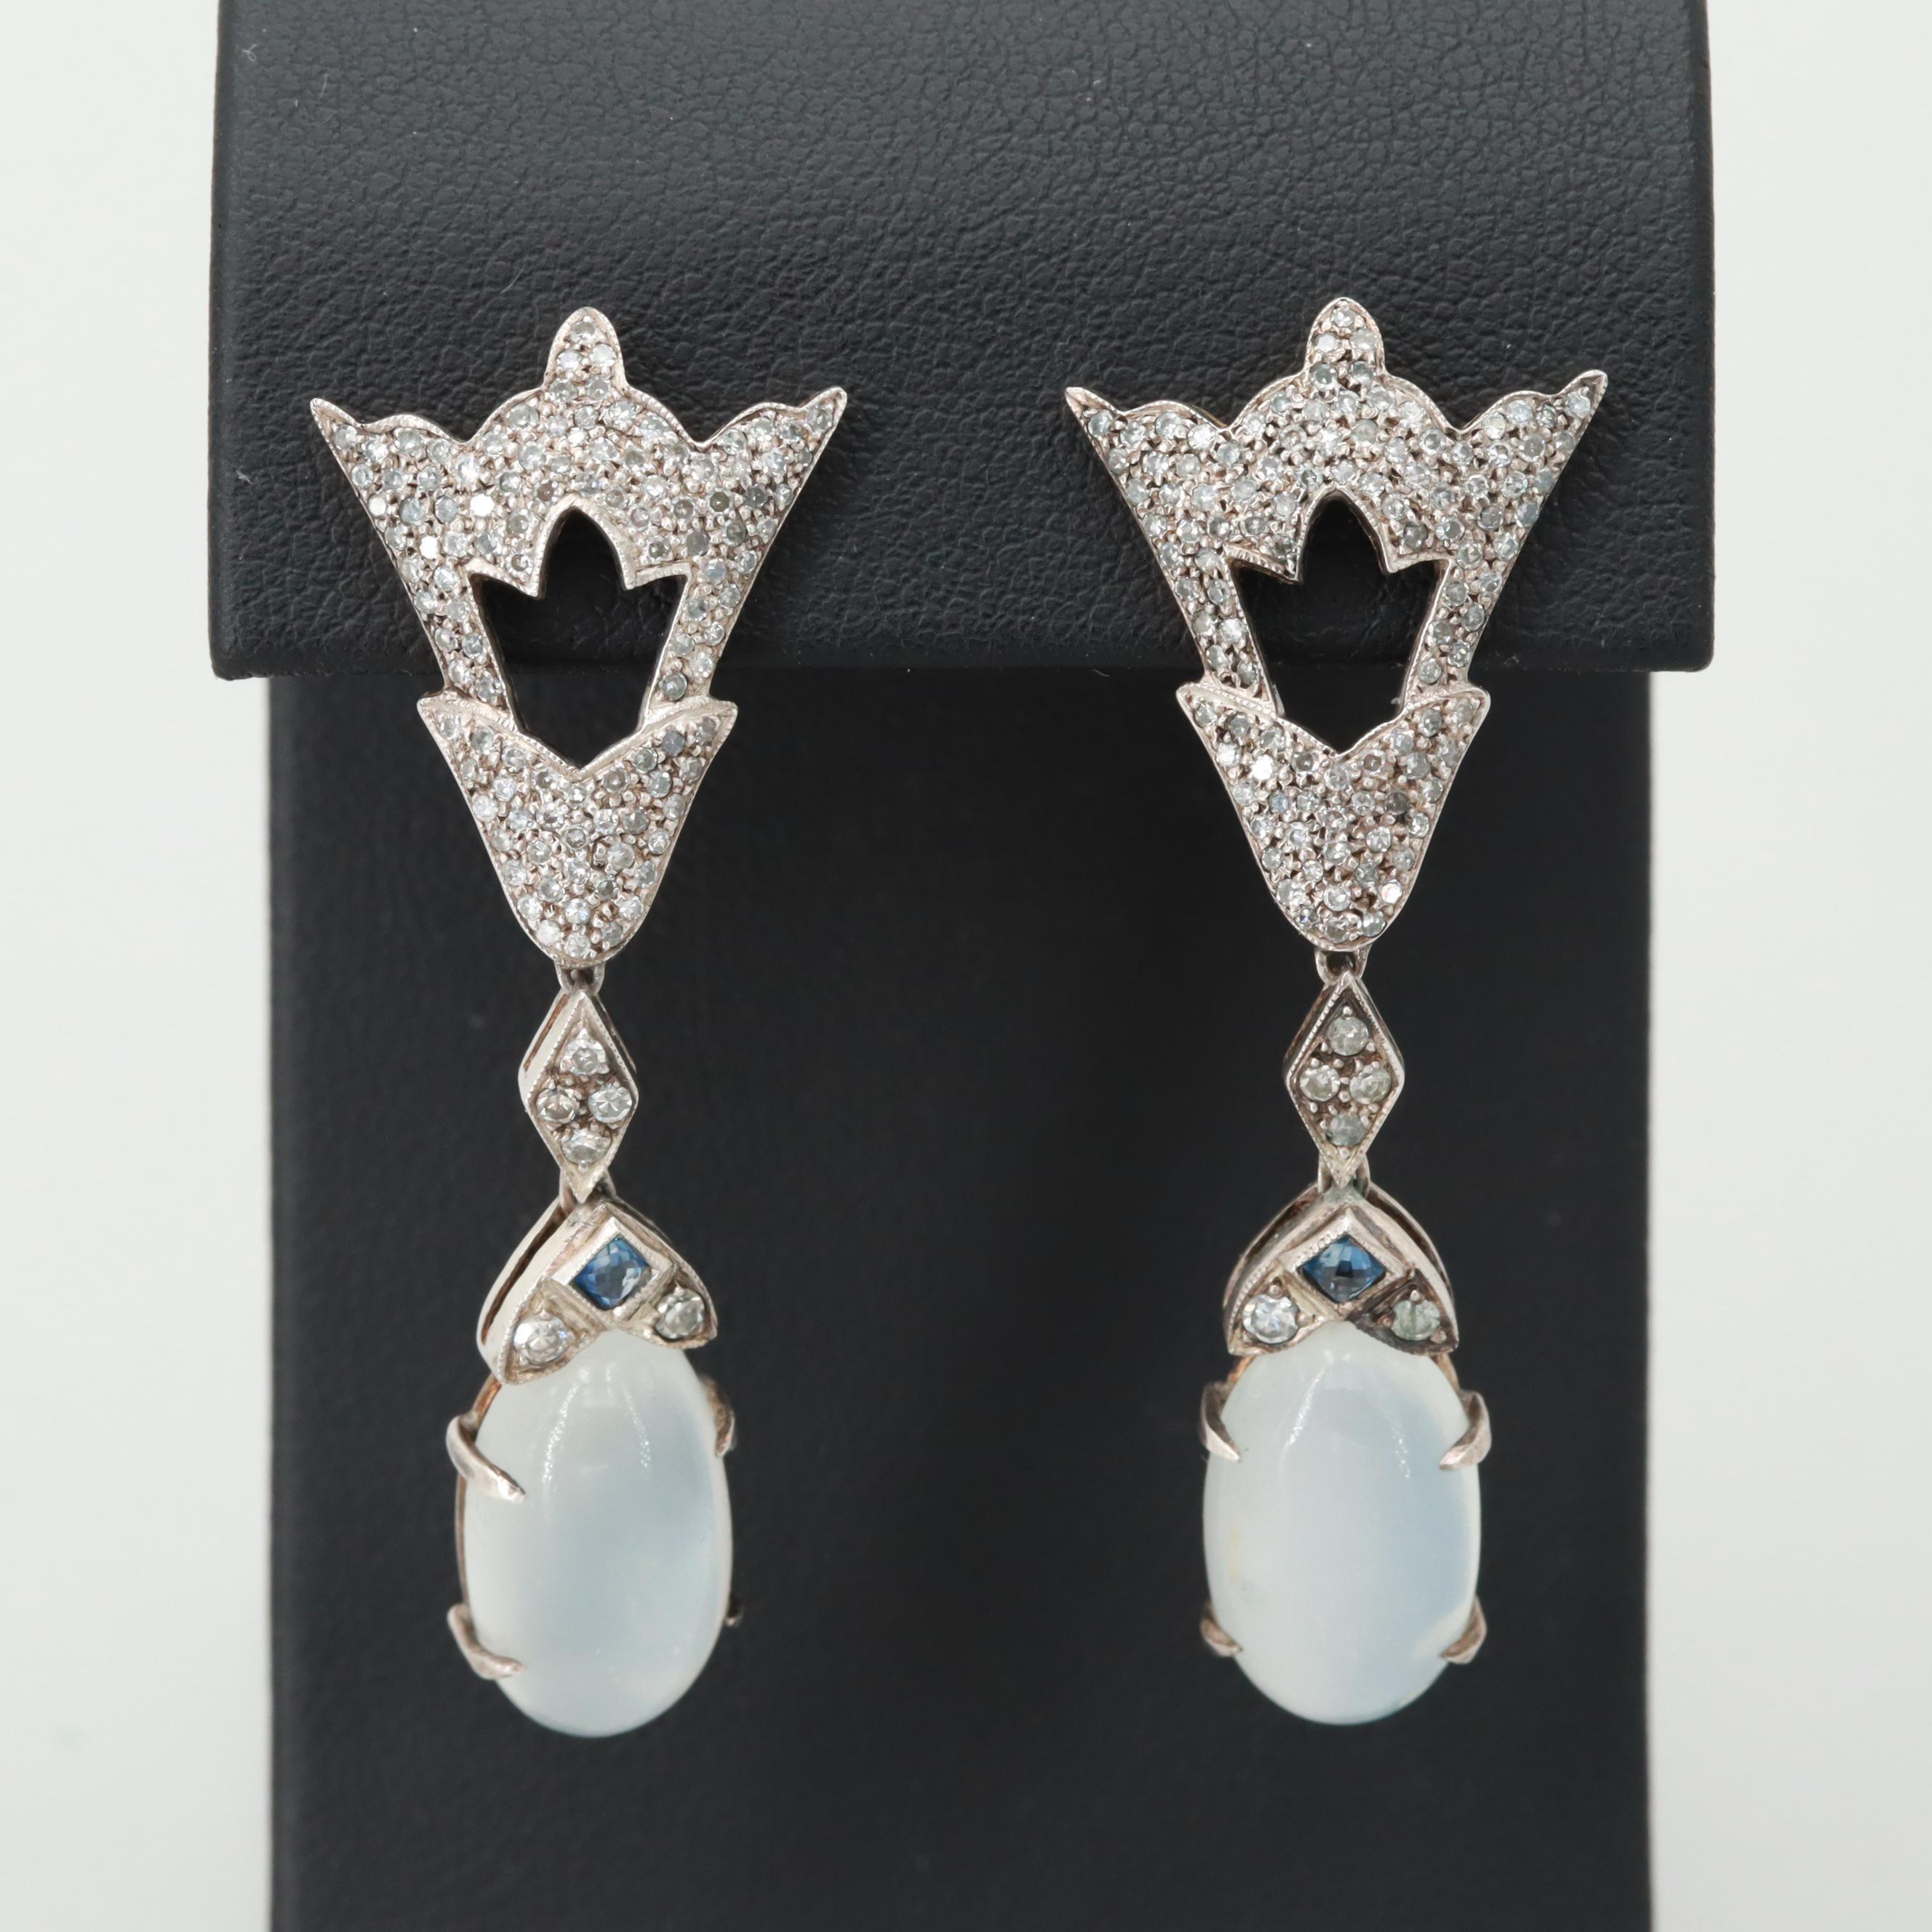 Art Deco Sterling Silver Moonstone, Diamond, and Sapphire Dangle Earrings